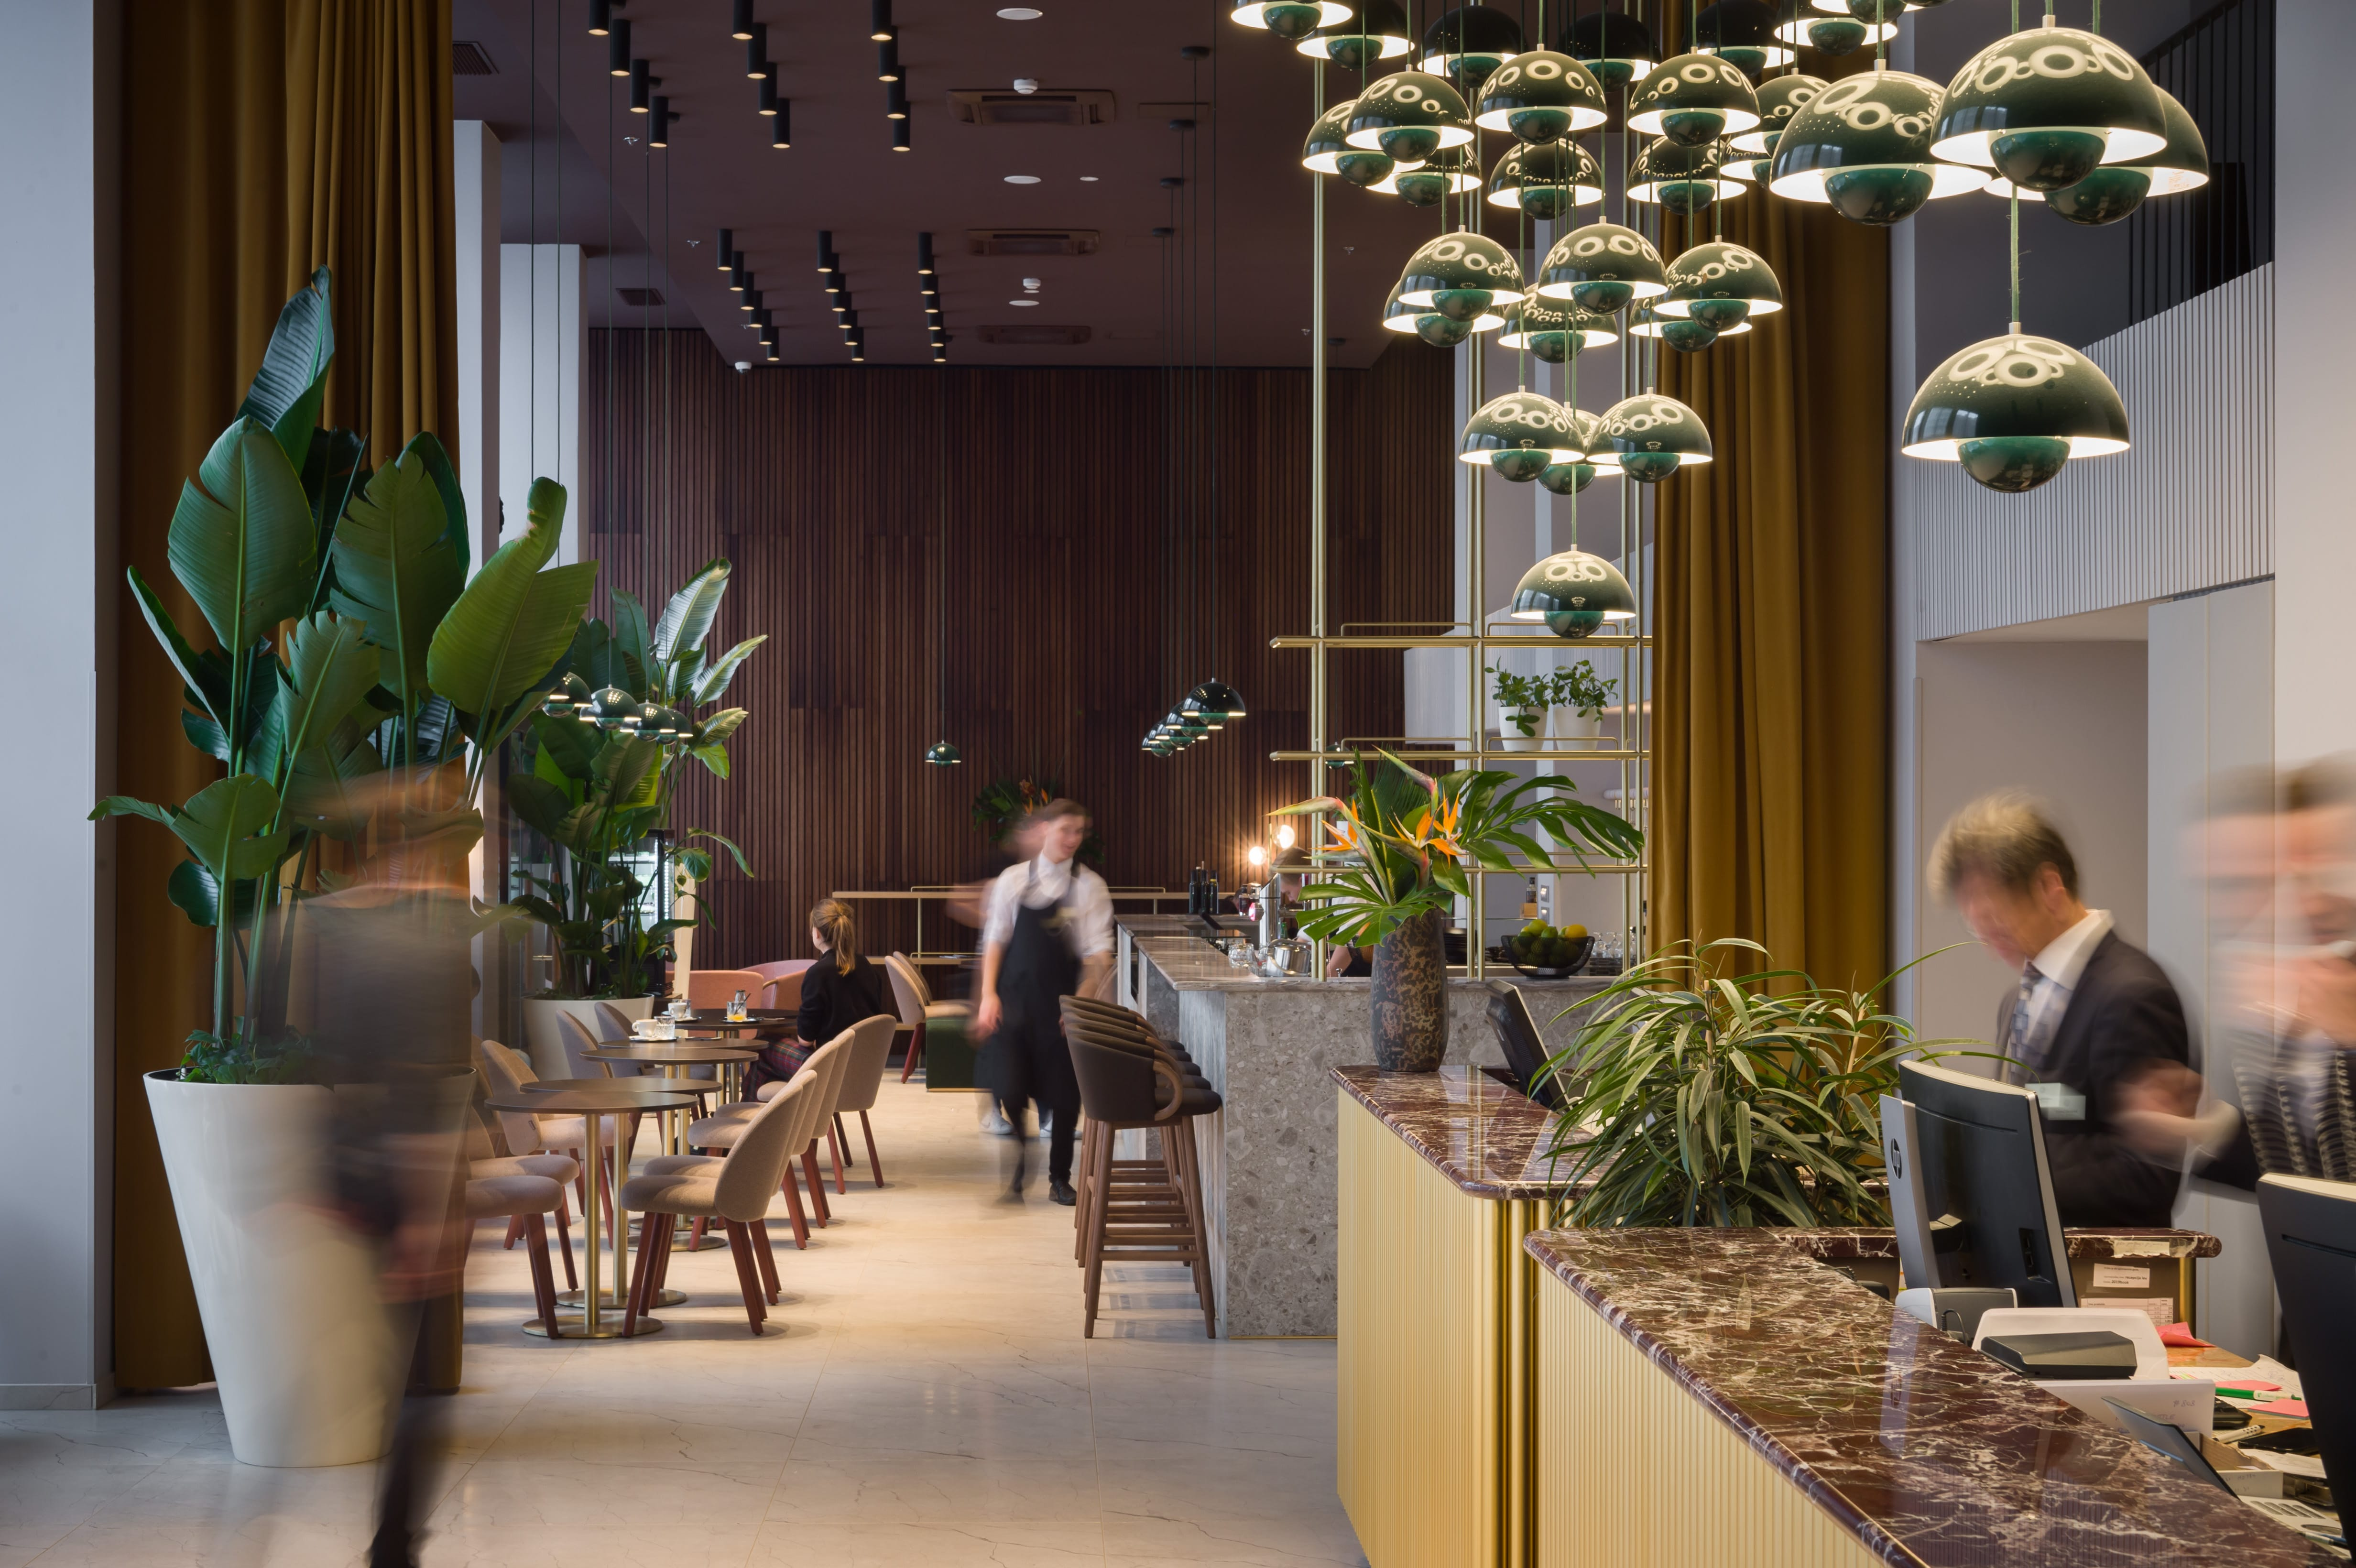 Hotel Lev Lobby photo Janez Marolt